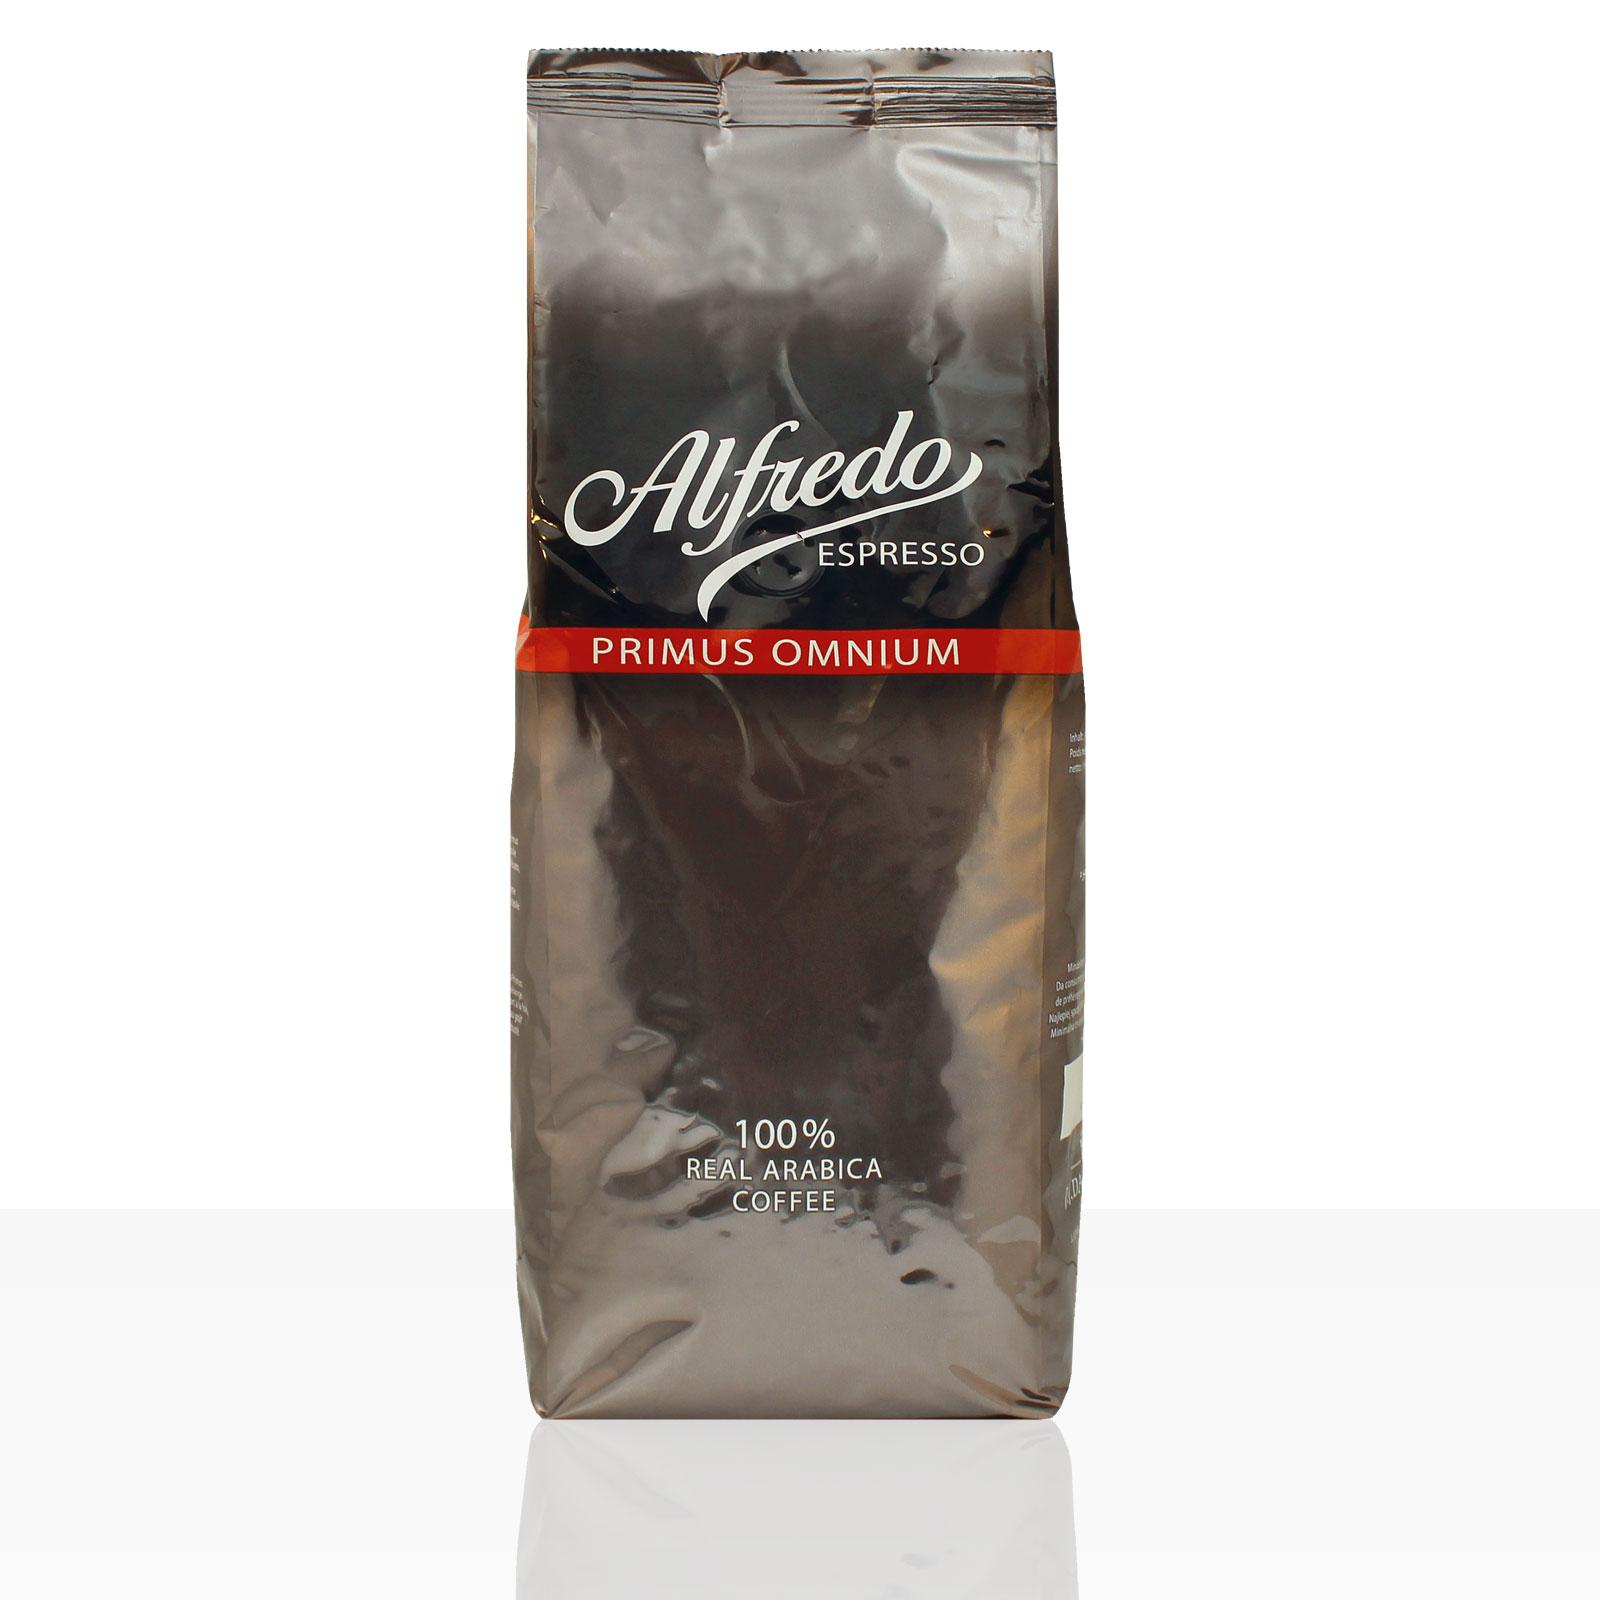 Darboven Alfredo Espresso Primus Omnium Kaffee 1kg ganze Bohne